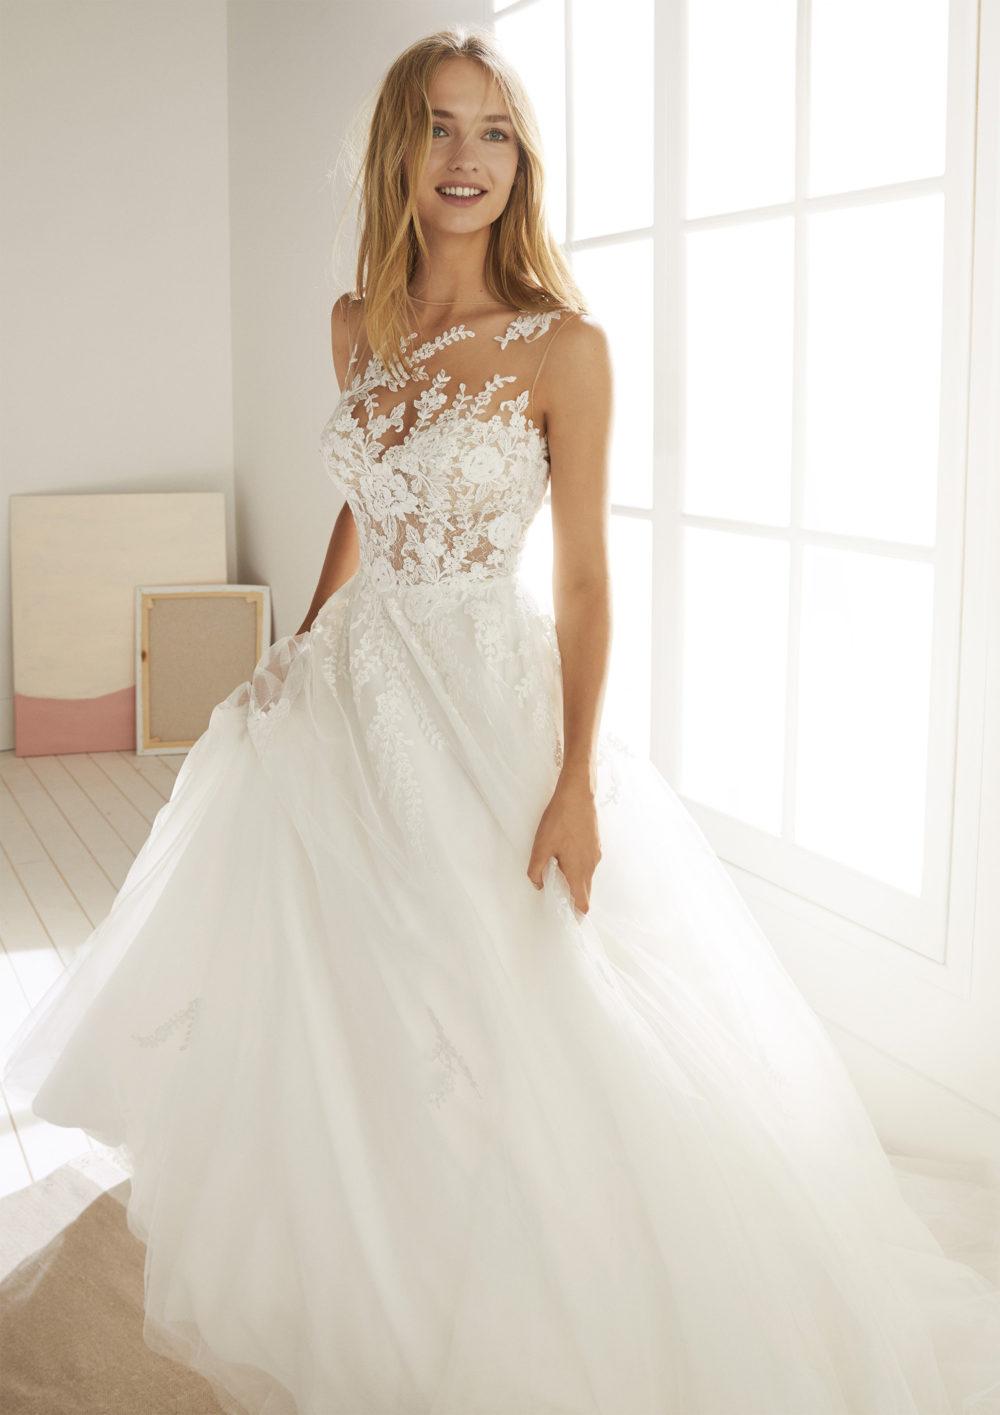 Mariages: abito da sposa Poéme 2020 a Vicenza, Verona, Padova, Veneto OROPESA